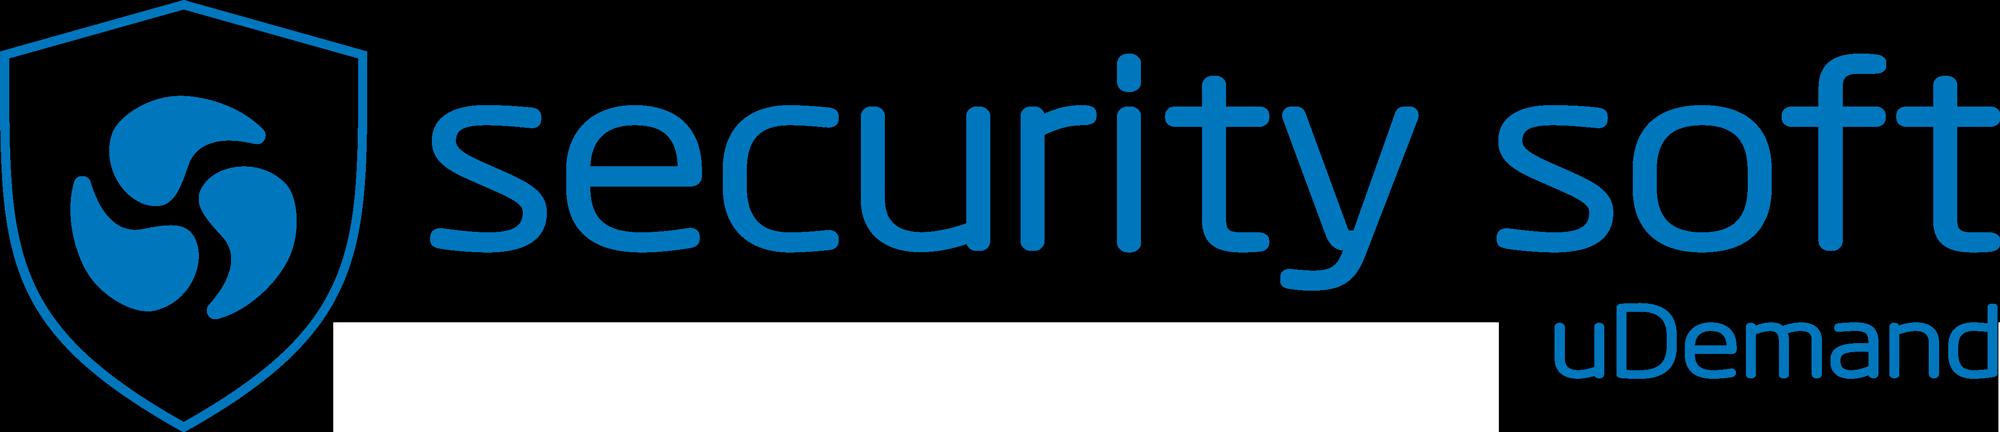 logo security soft udemand